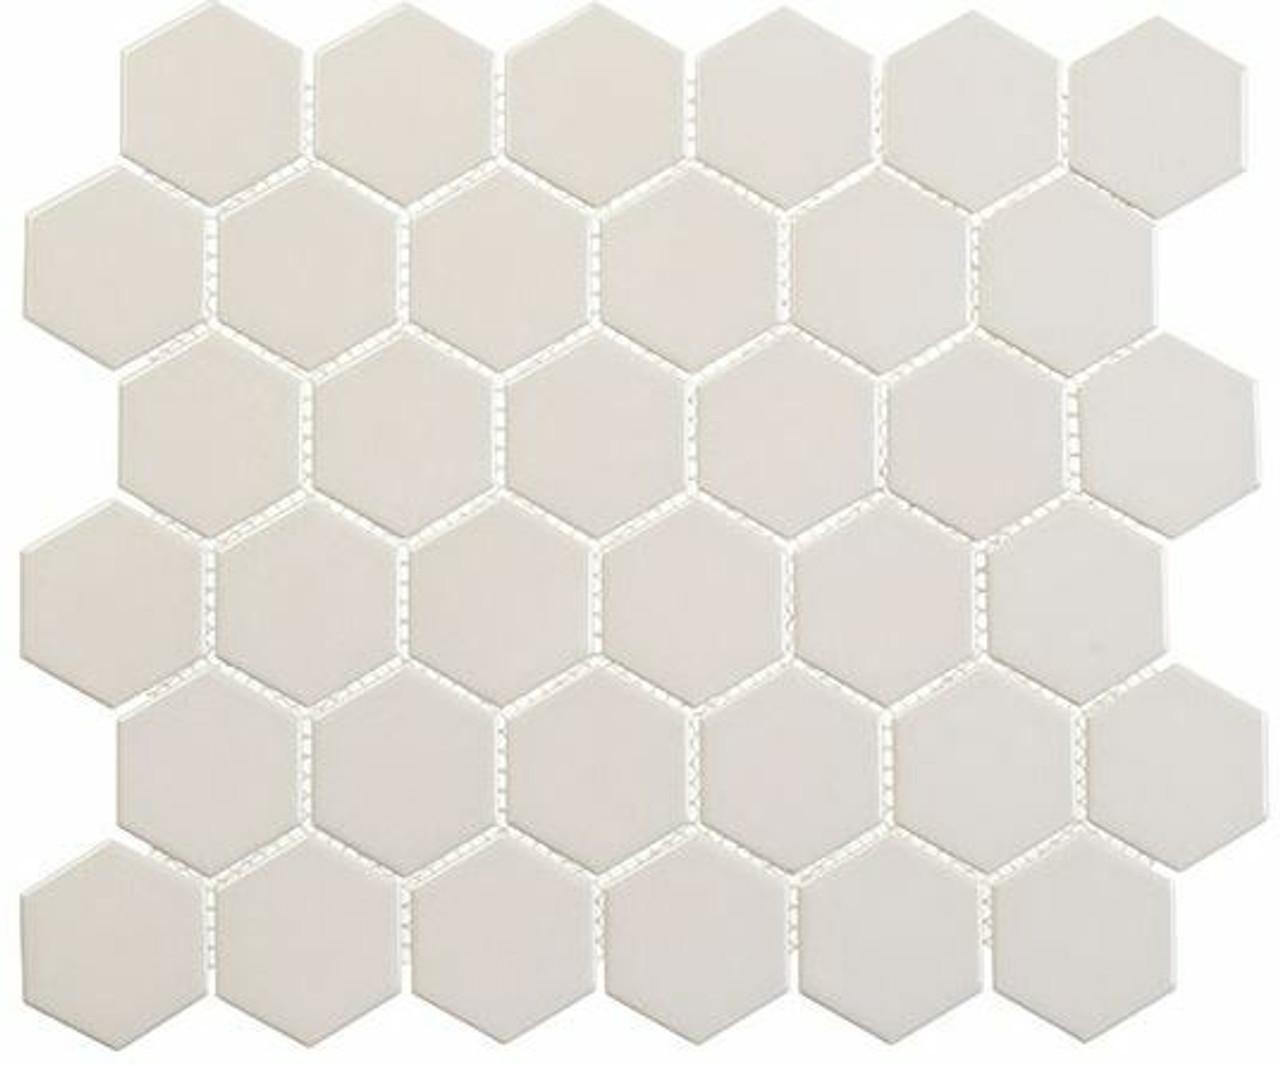 Bella Glass Tiles Freedom Avenue 2 inch Hexagon Empire Place FDM1822